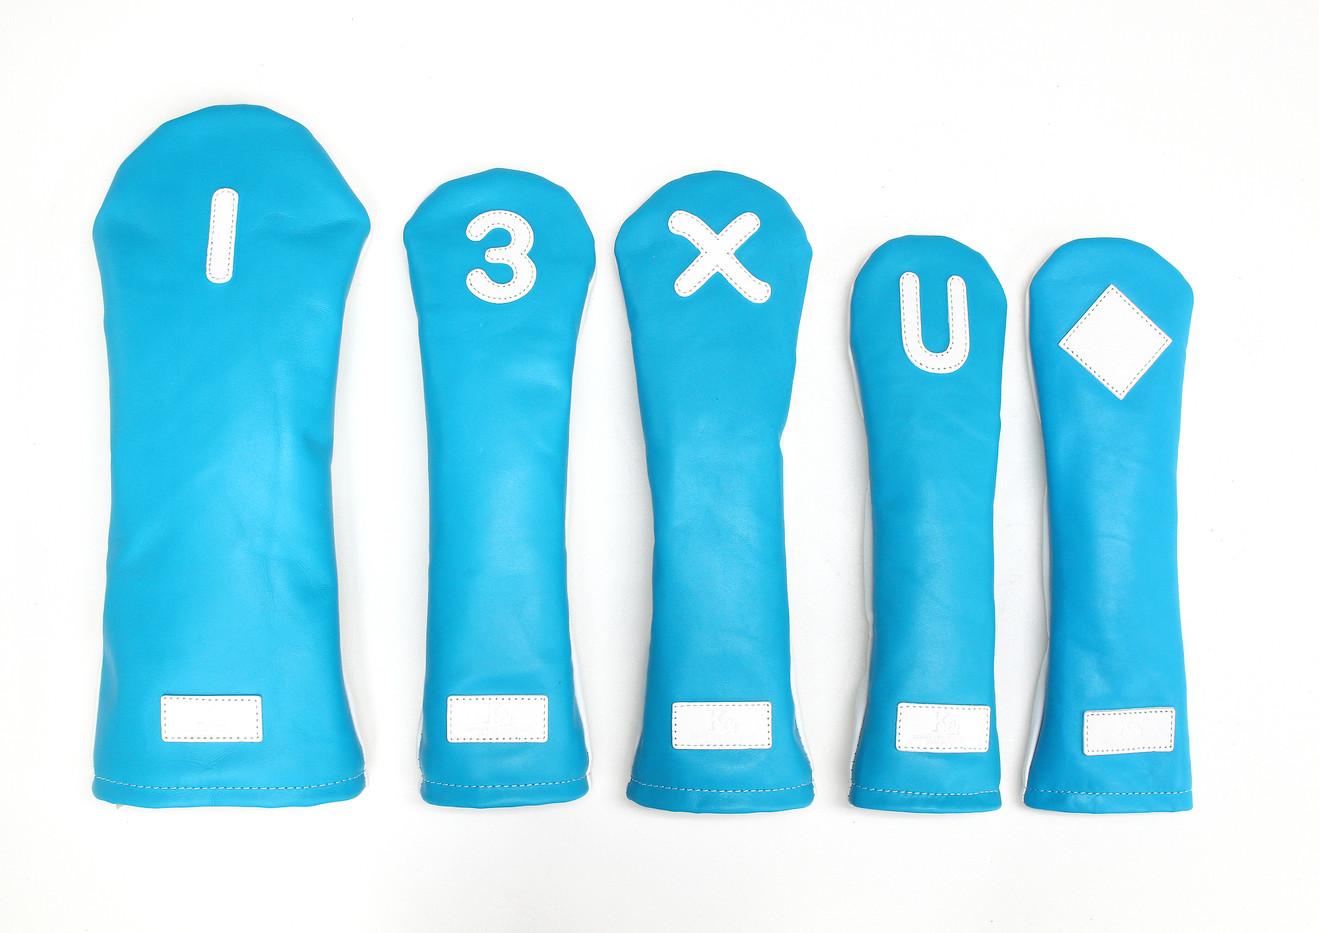 K& HC-Mit 総革ヘッドカバー ブルー 表  1 3 X U ♢.jpg